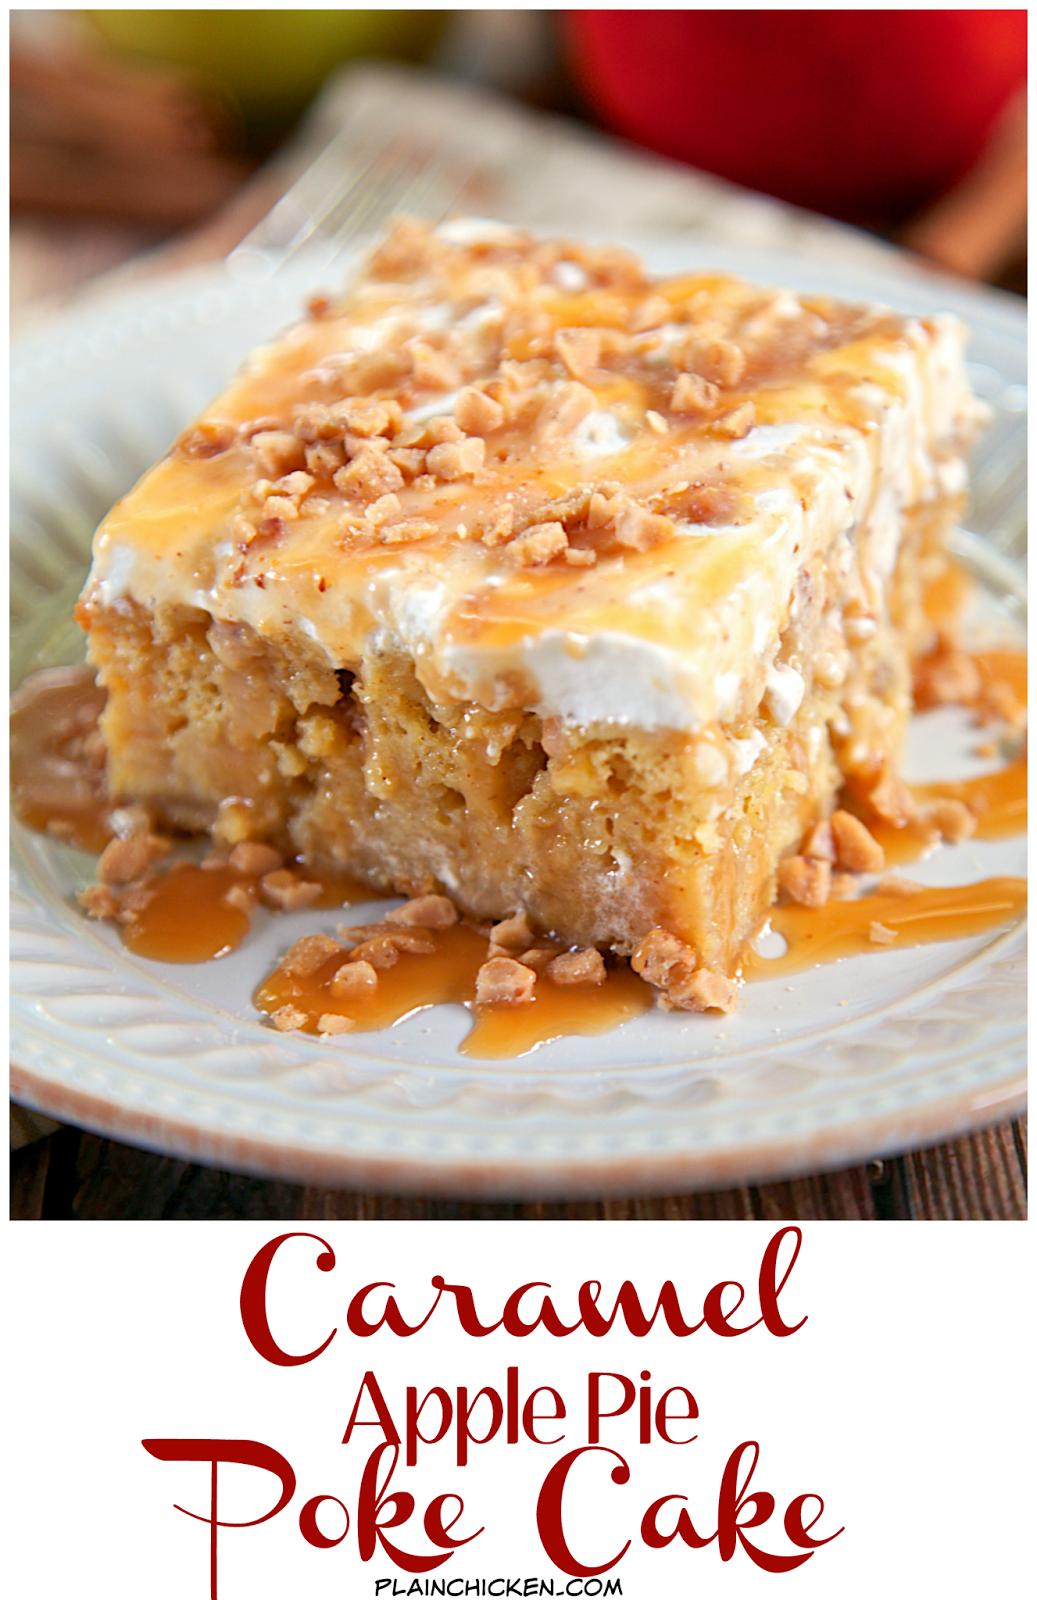 Caramel Apple Pie Poke Cake Recipe apple cake soaked in